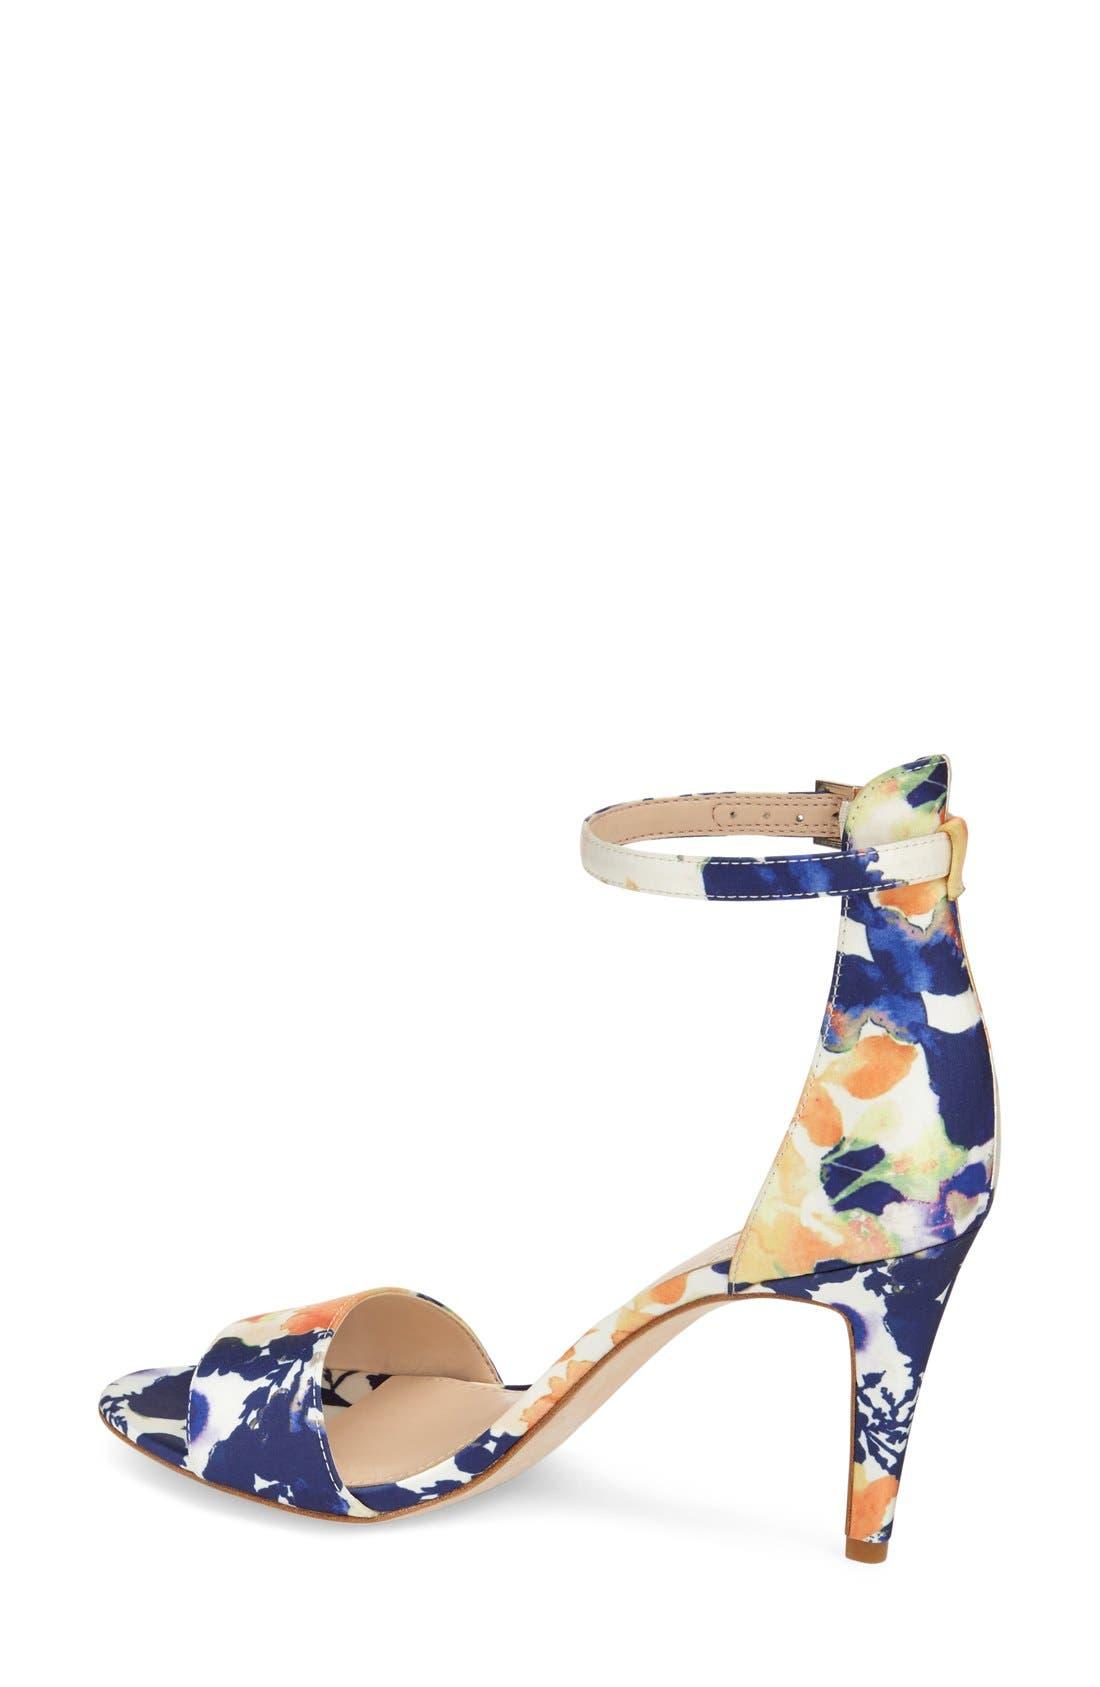 ,                             'Court' Ankle Strap Sandal,                             Alternate thumbnail 73, color,                             540